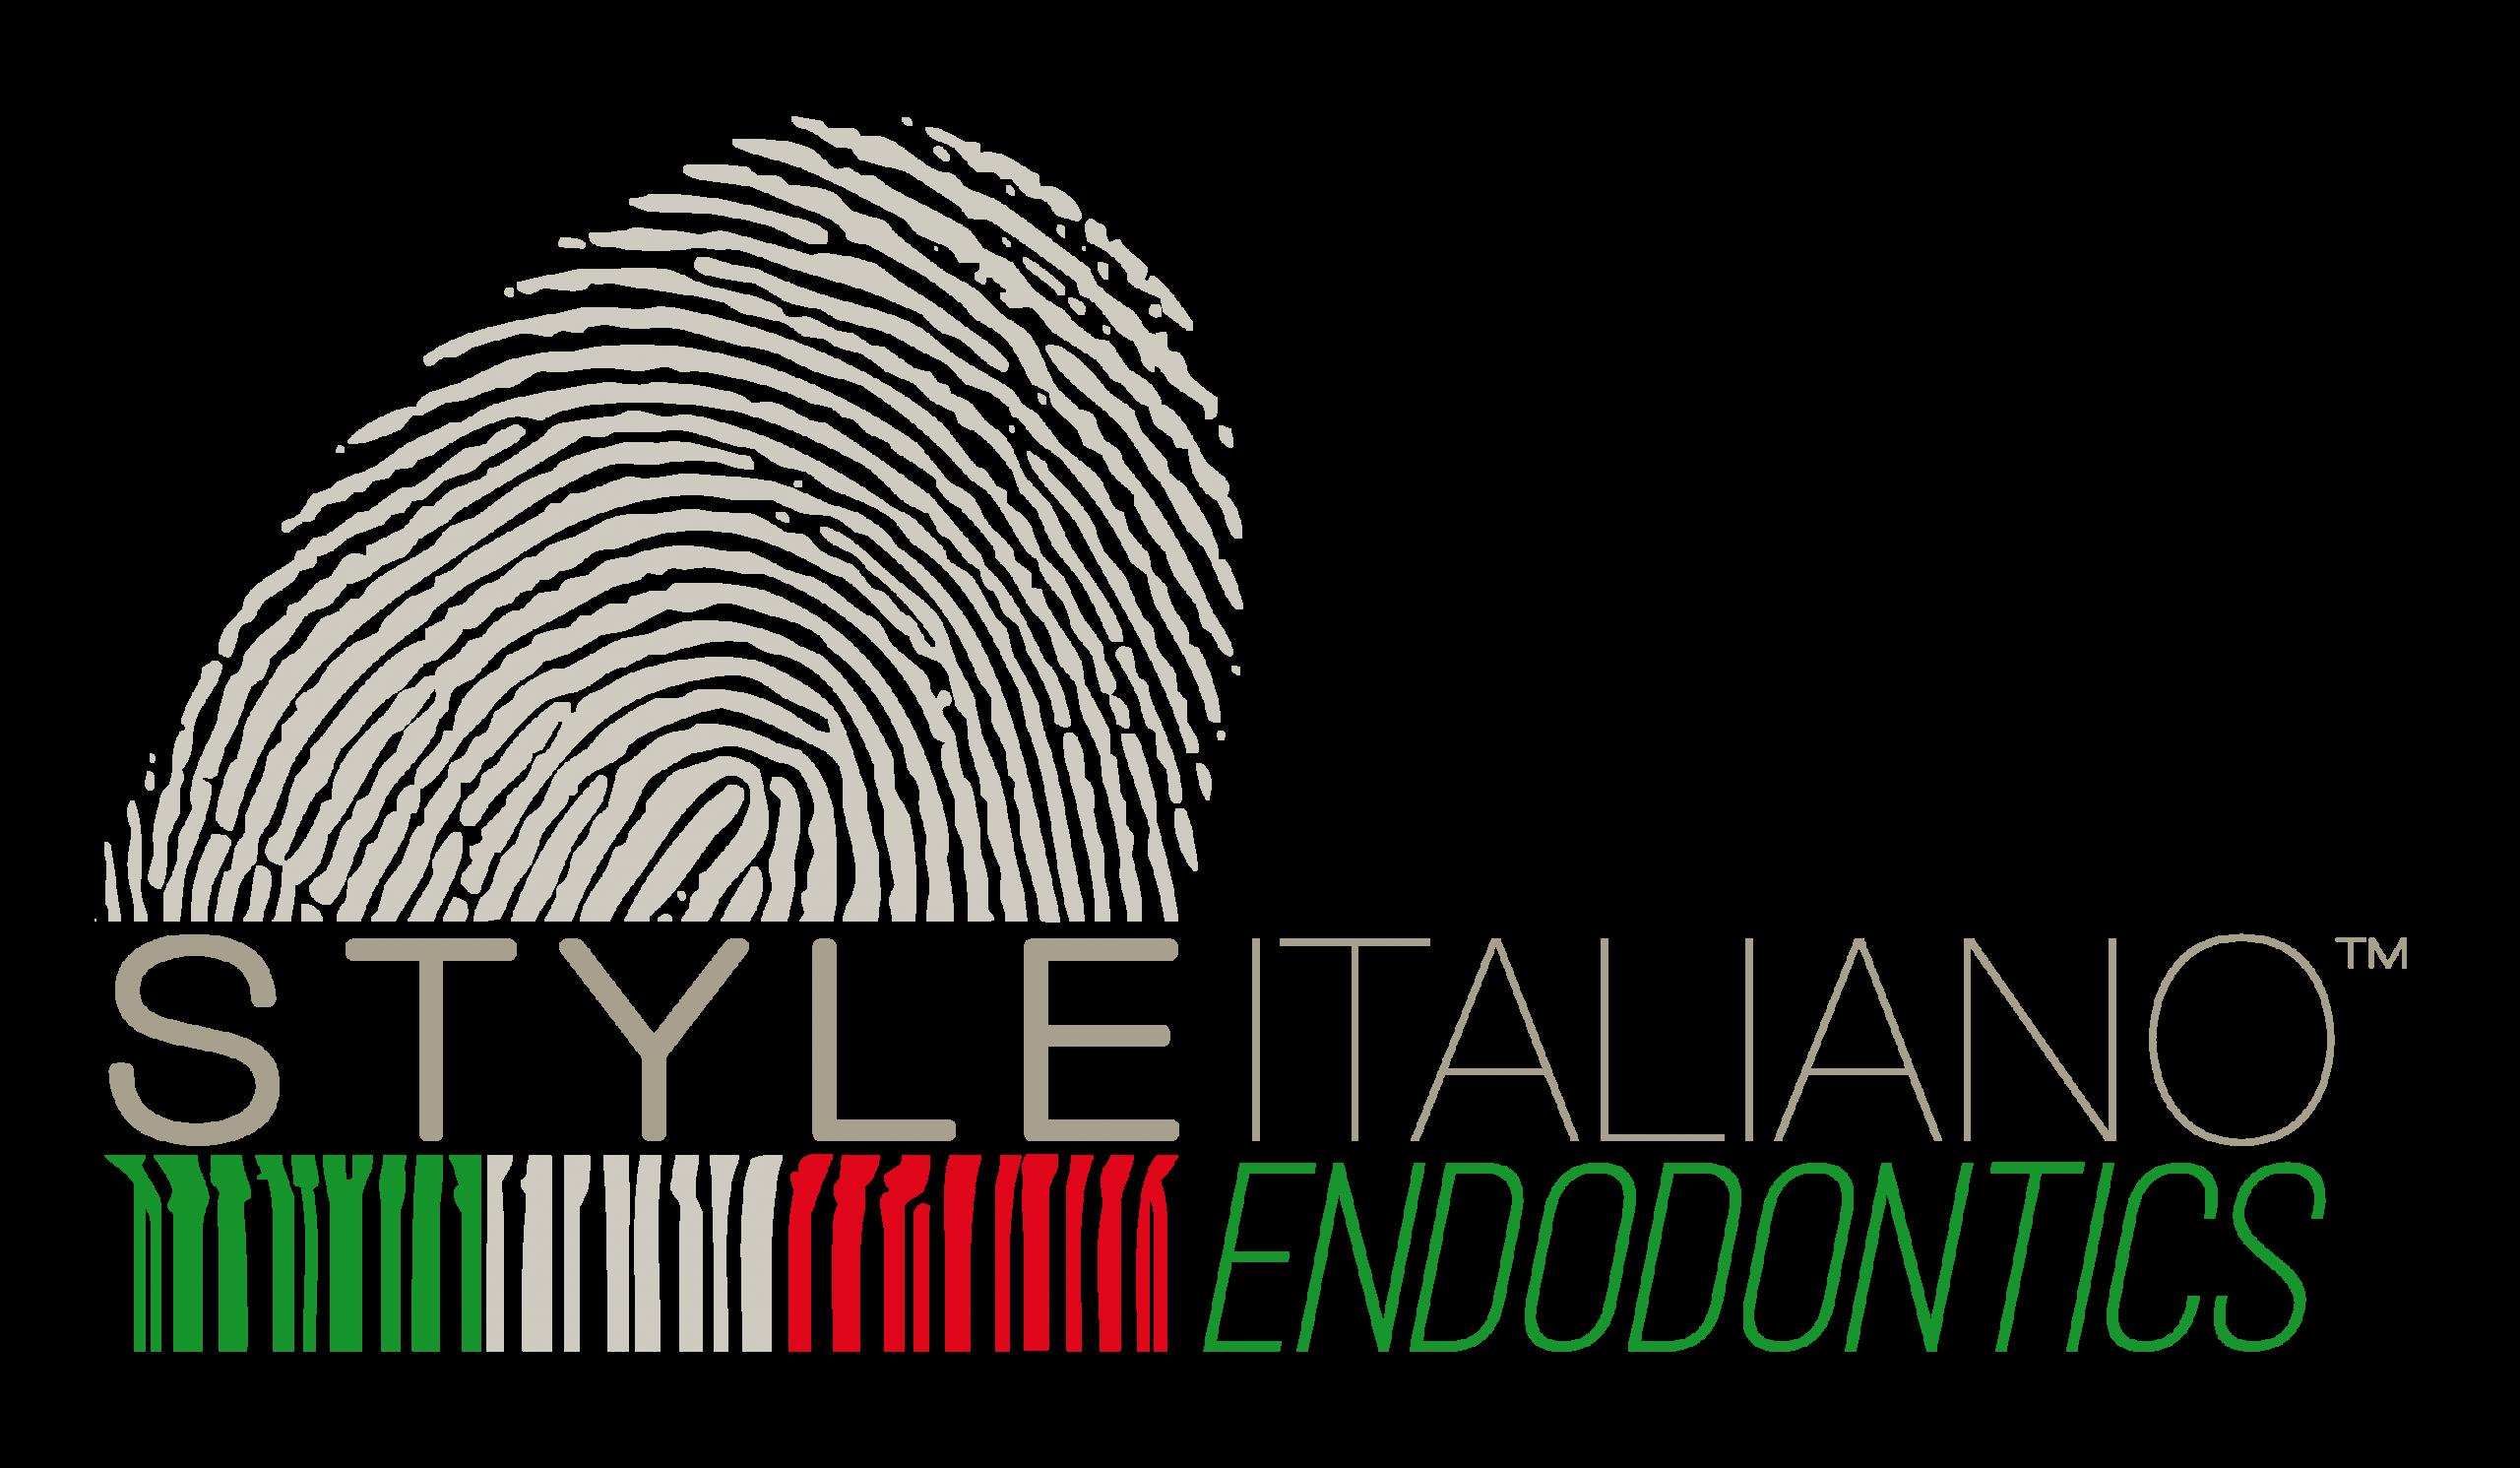 Style Italiano Endodontics